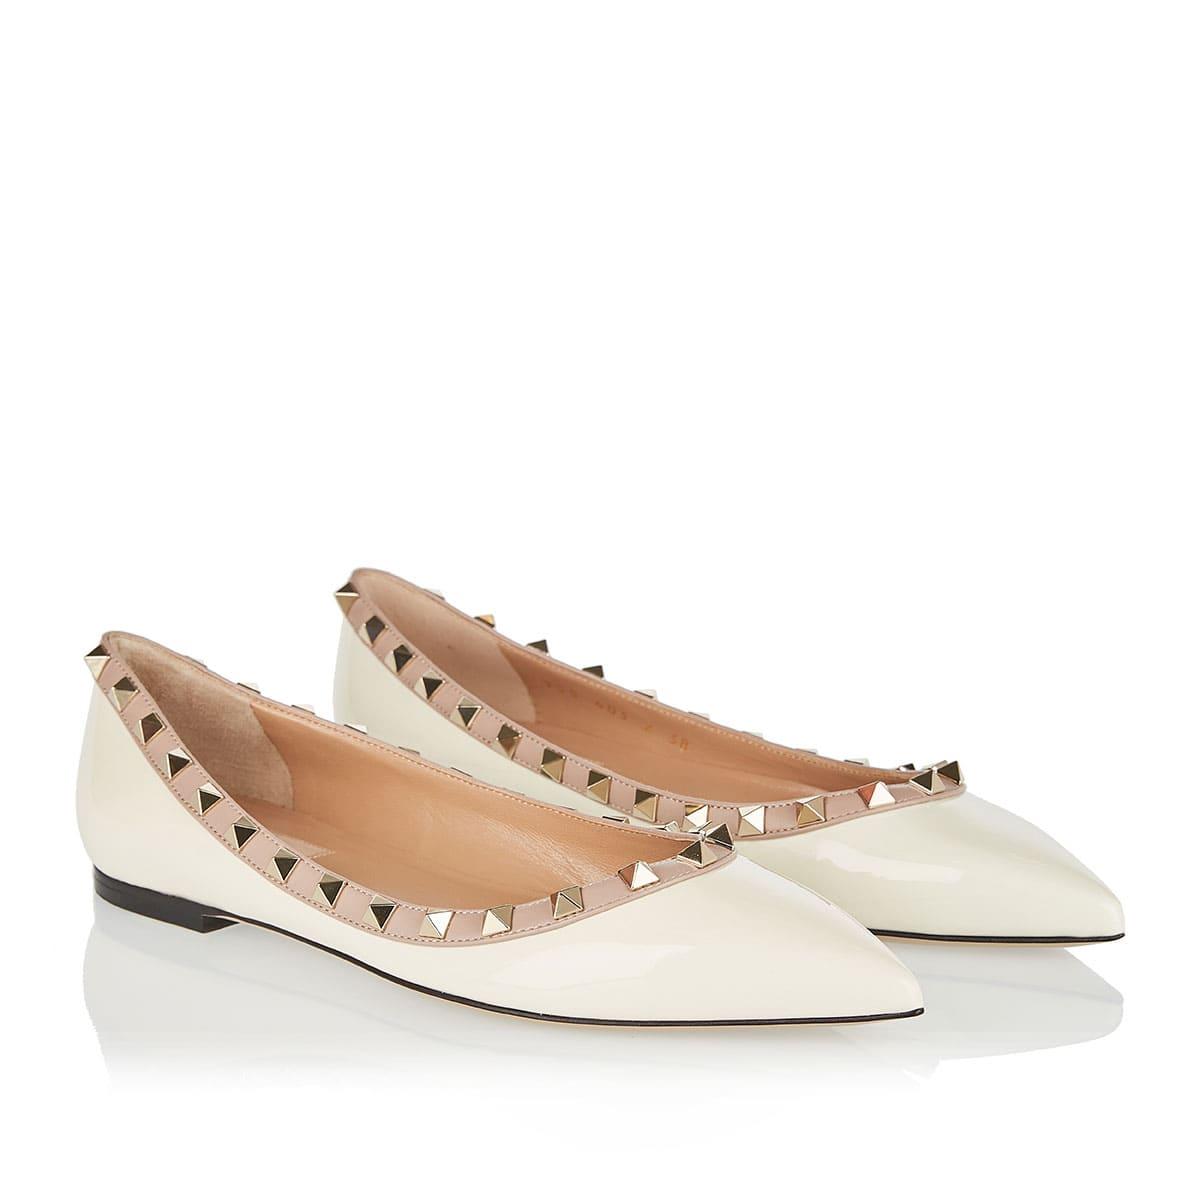 Rockstud flat shoes